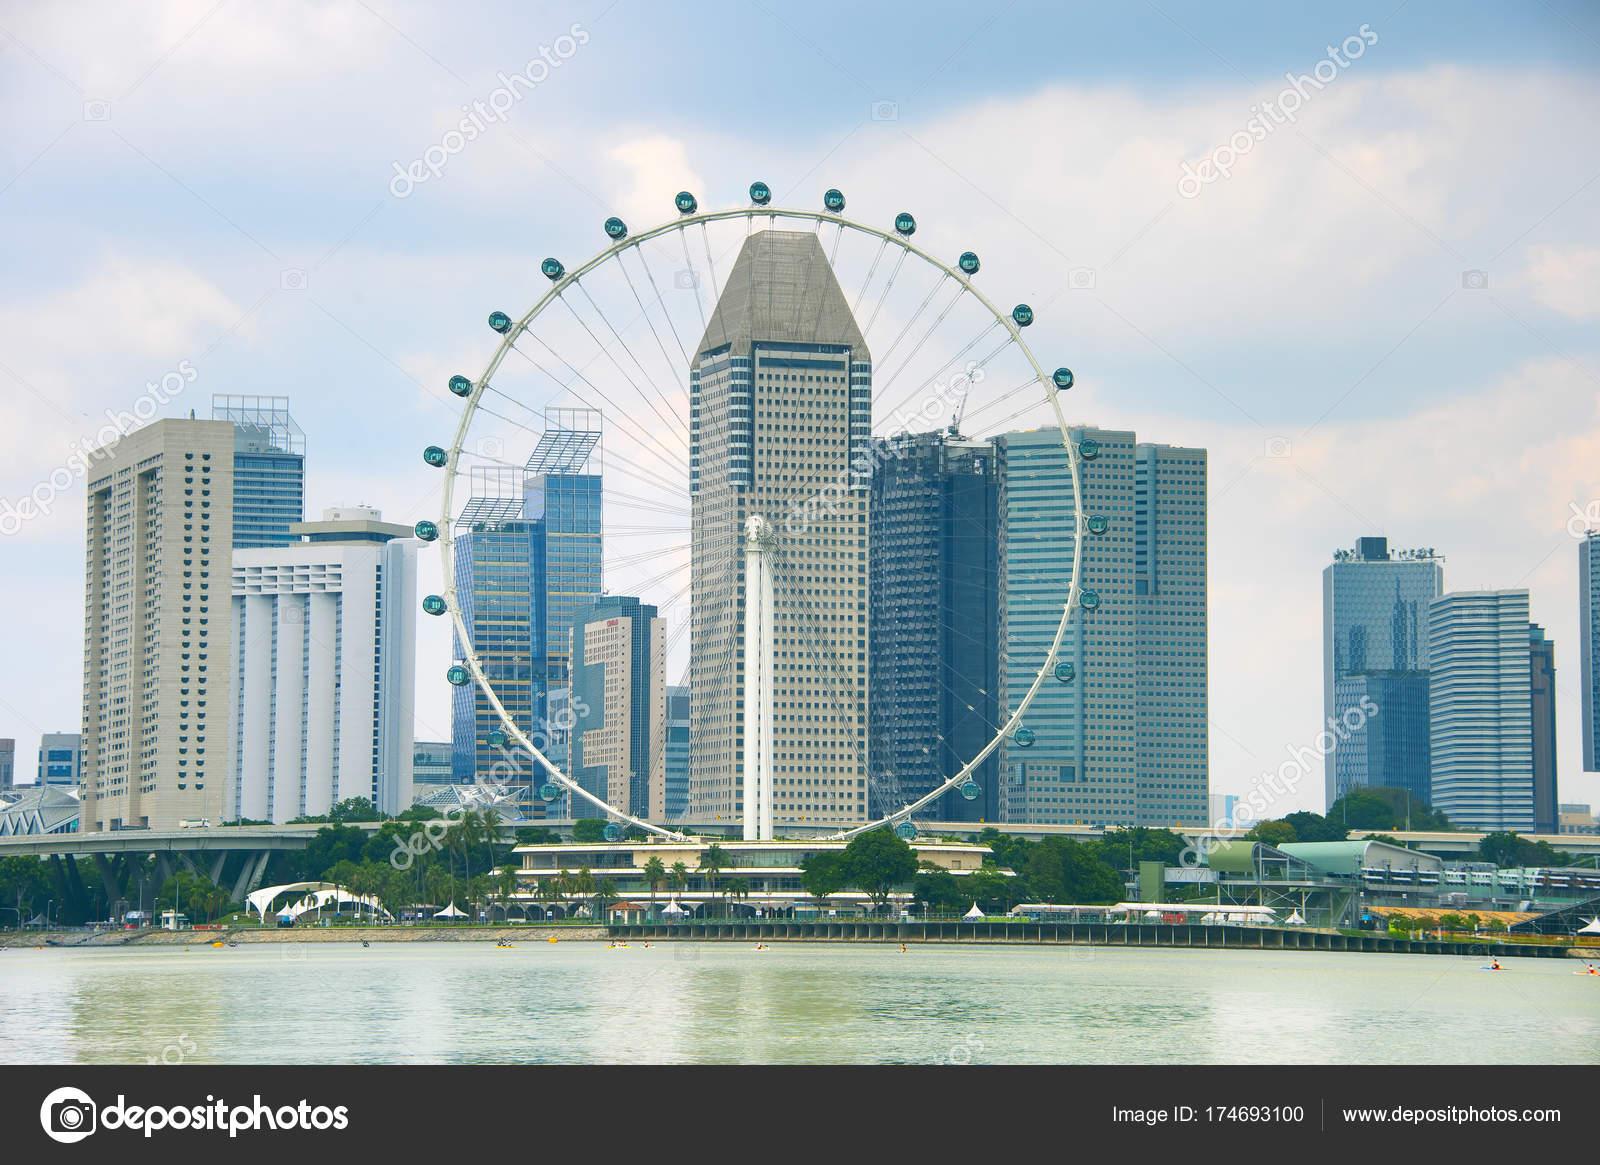 Vista Del Singapore Flyer Modernos Rascacielos Fondo Foto De Stock